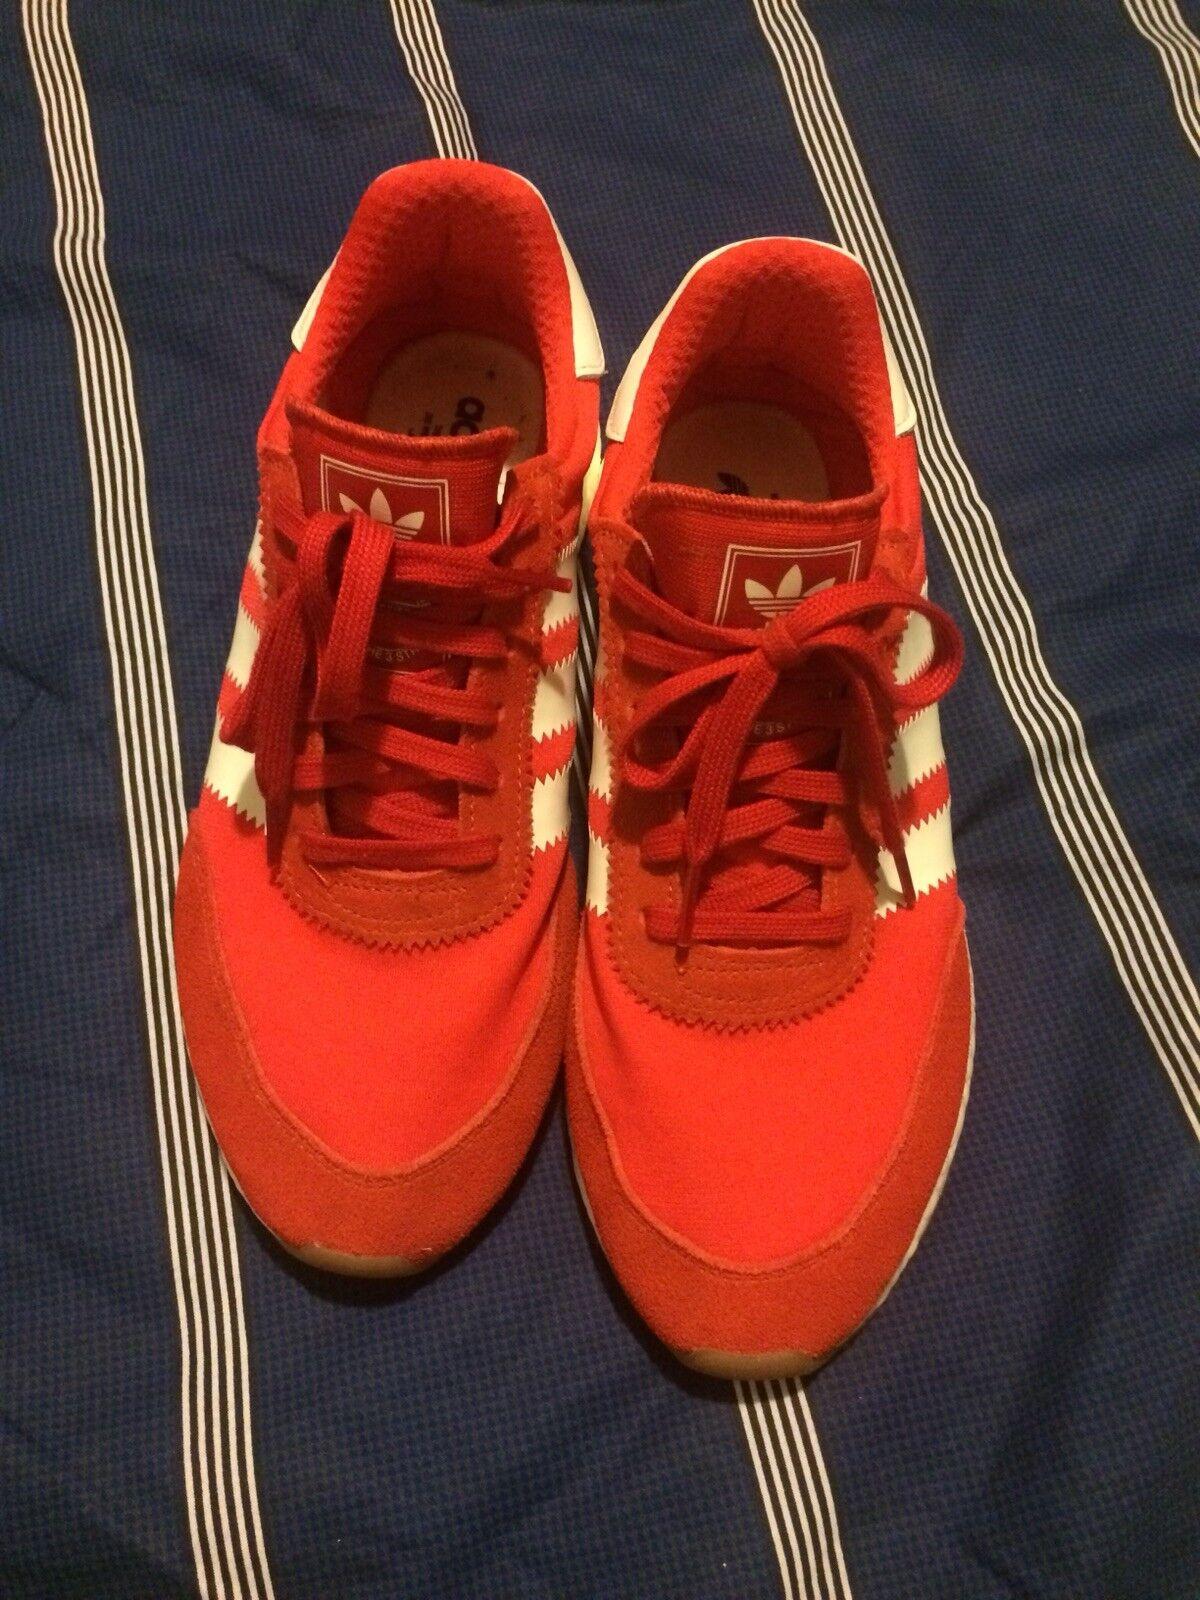 Adidas Iniki Runner Boost Men's Size US 9